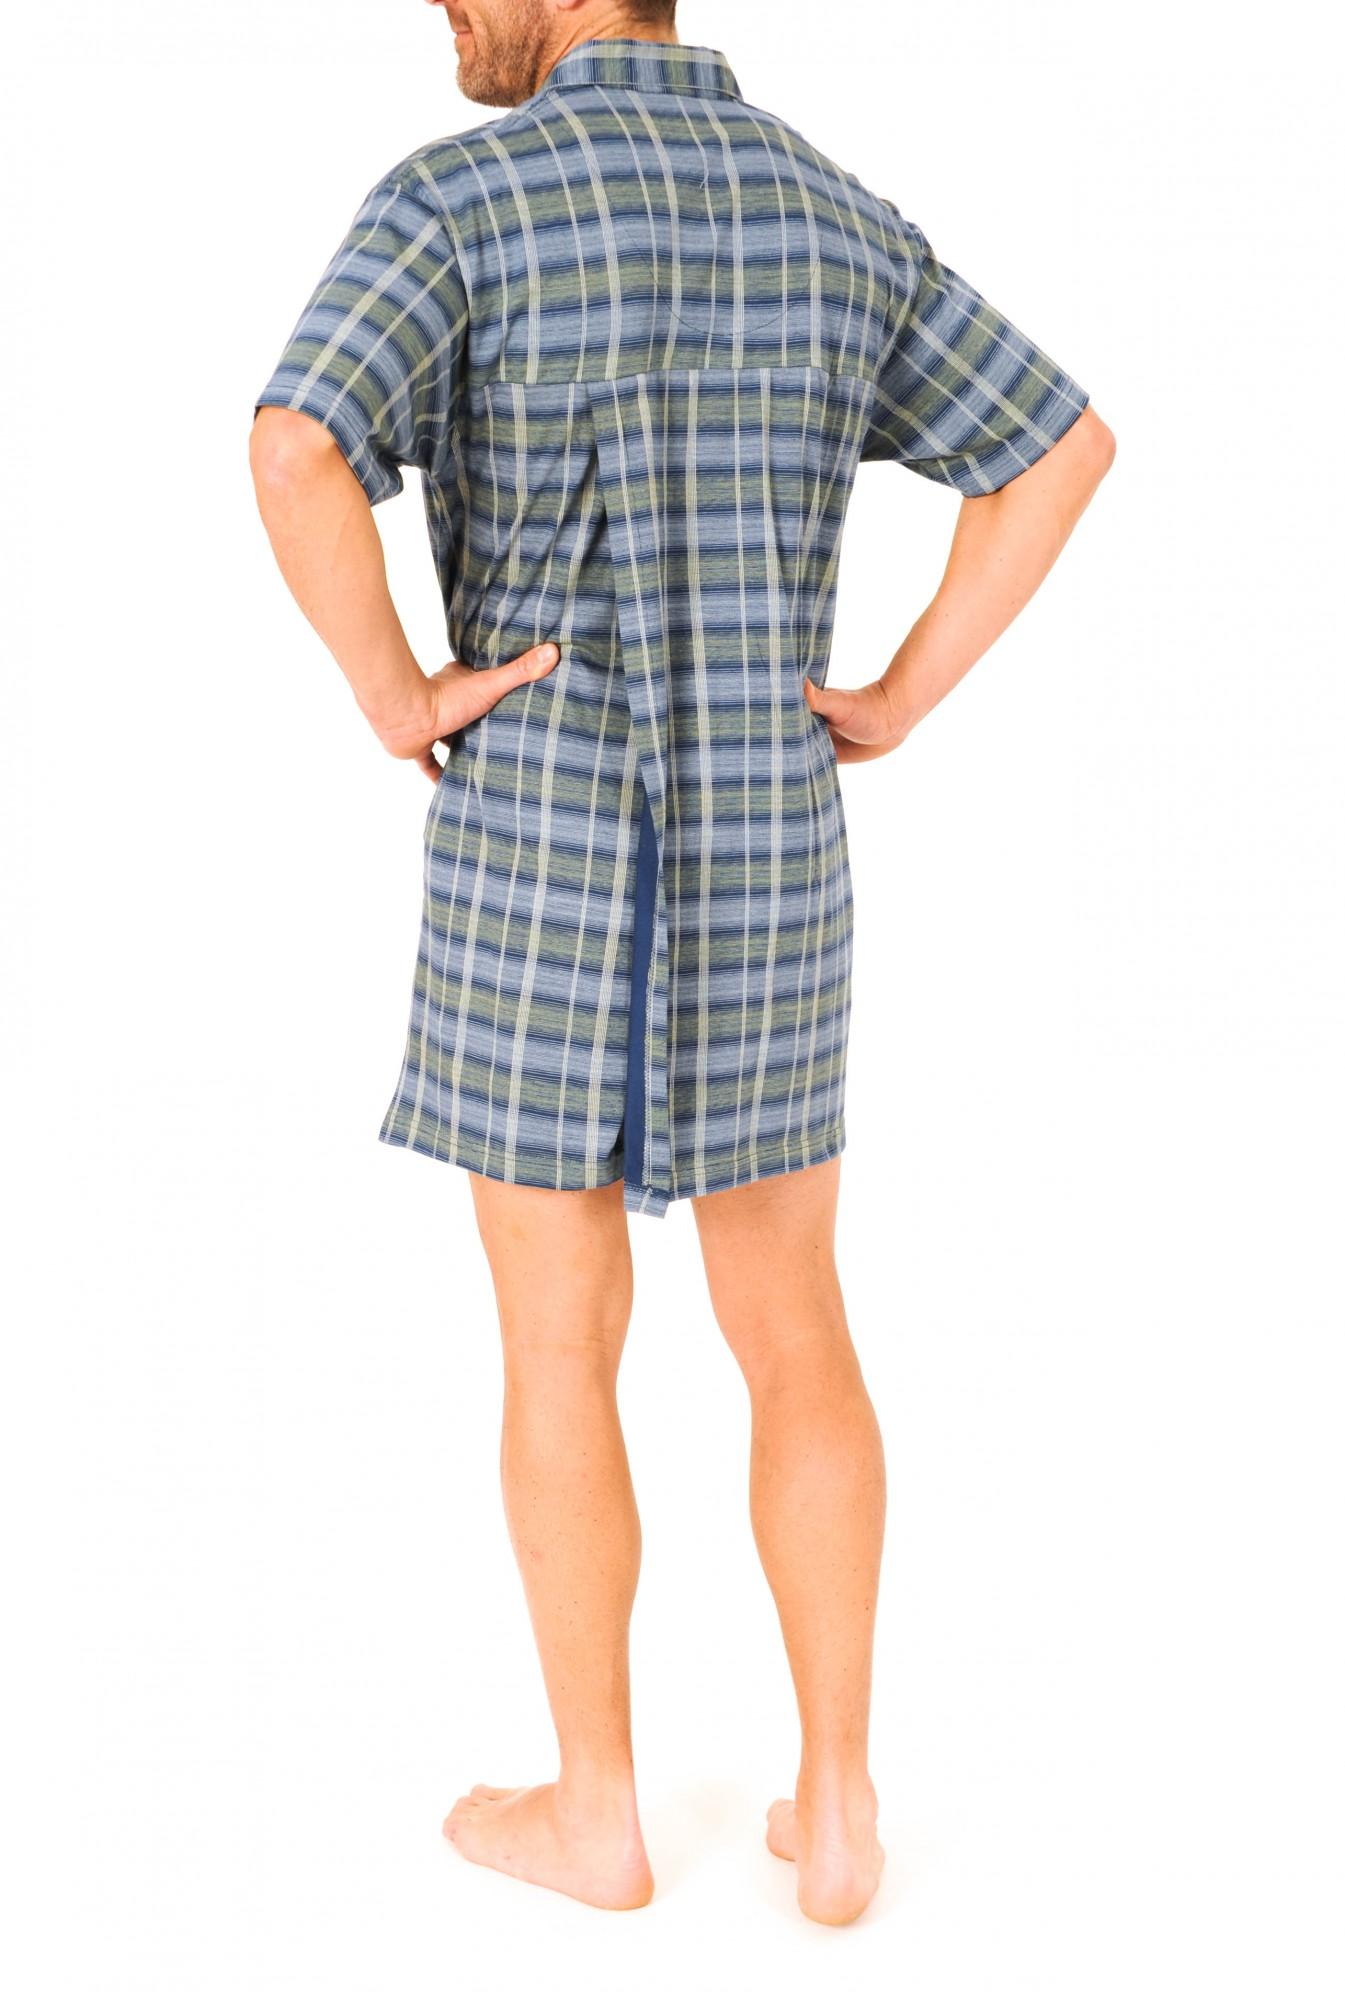 Herren Pflegenachthemd kurzarm, 53045 – Bild 2